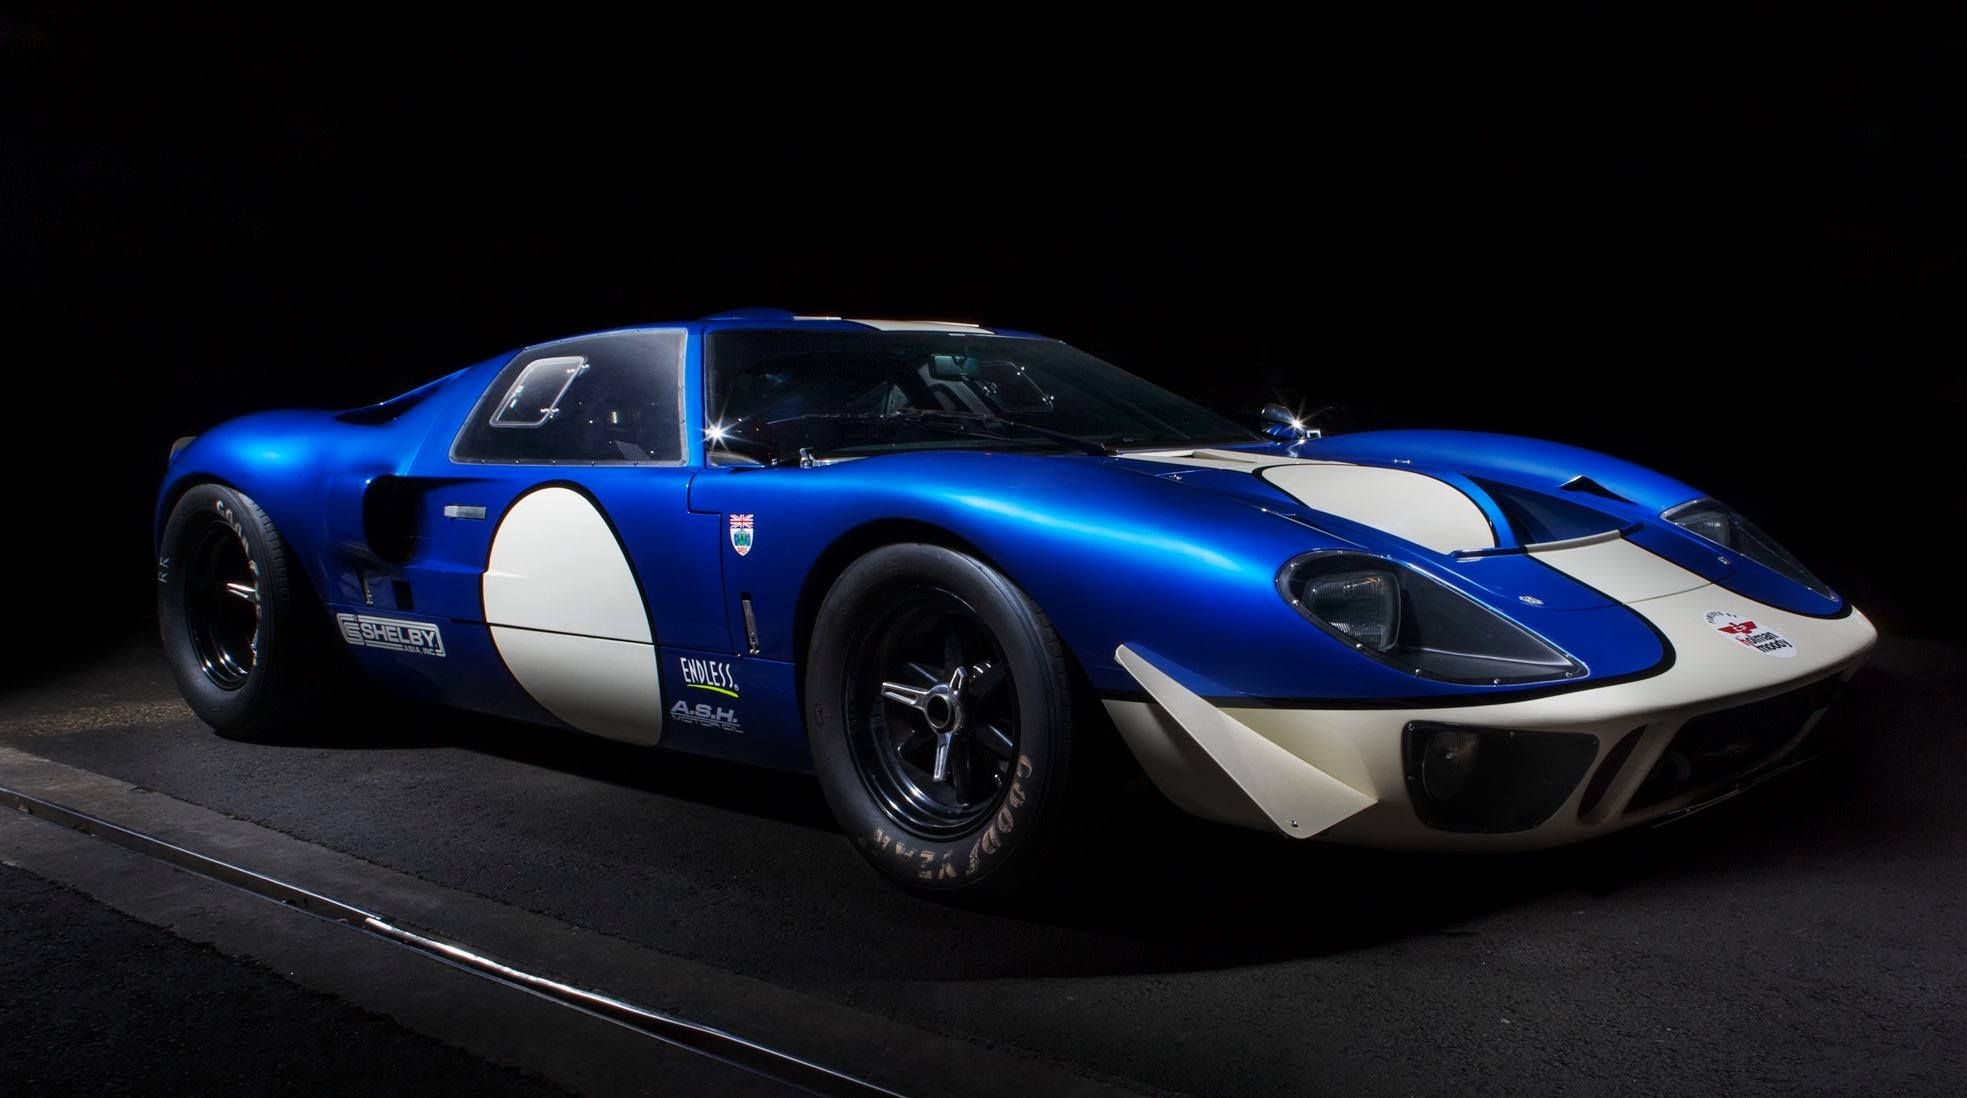 Gt40 Vs Cobra Track Battle Videos Superformance Brings American Racecar Glory Global Via Shelby Asia Car Revs Daily Com Ford Gt40 Gt40 Vintage Sports Cars